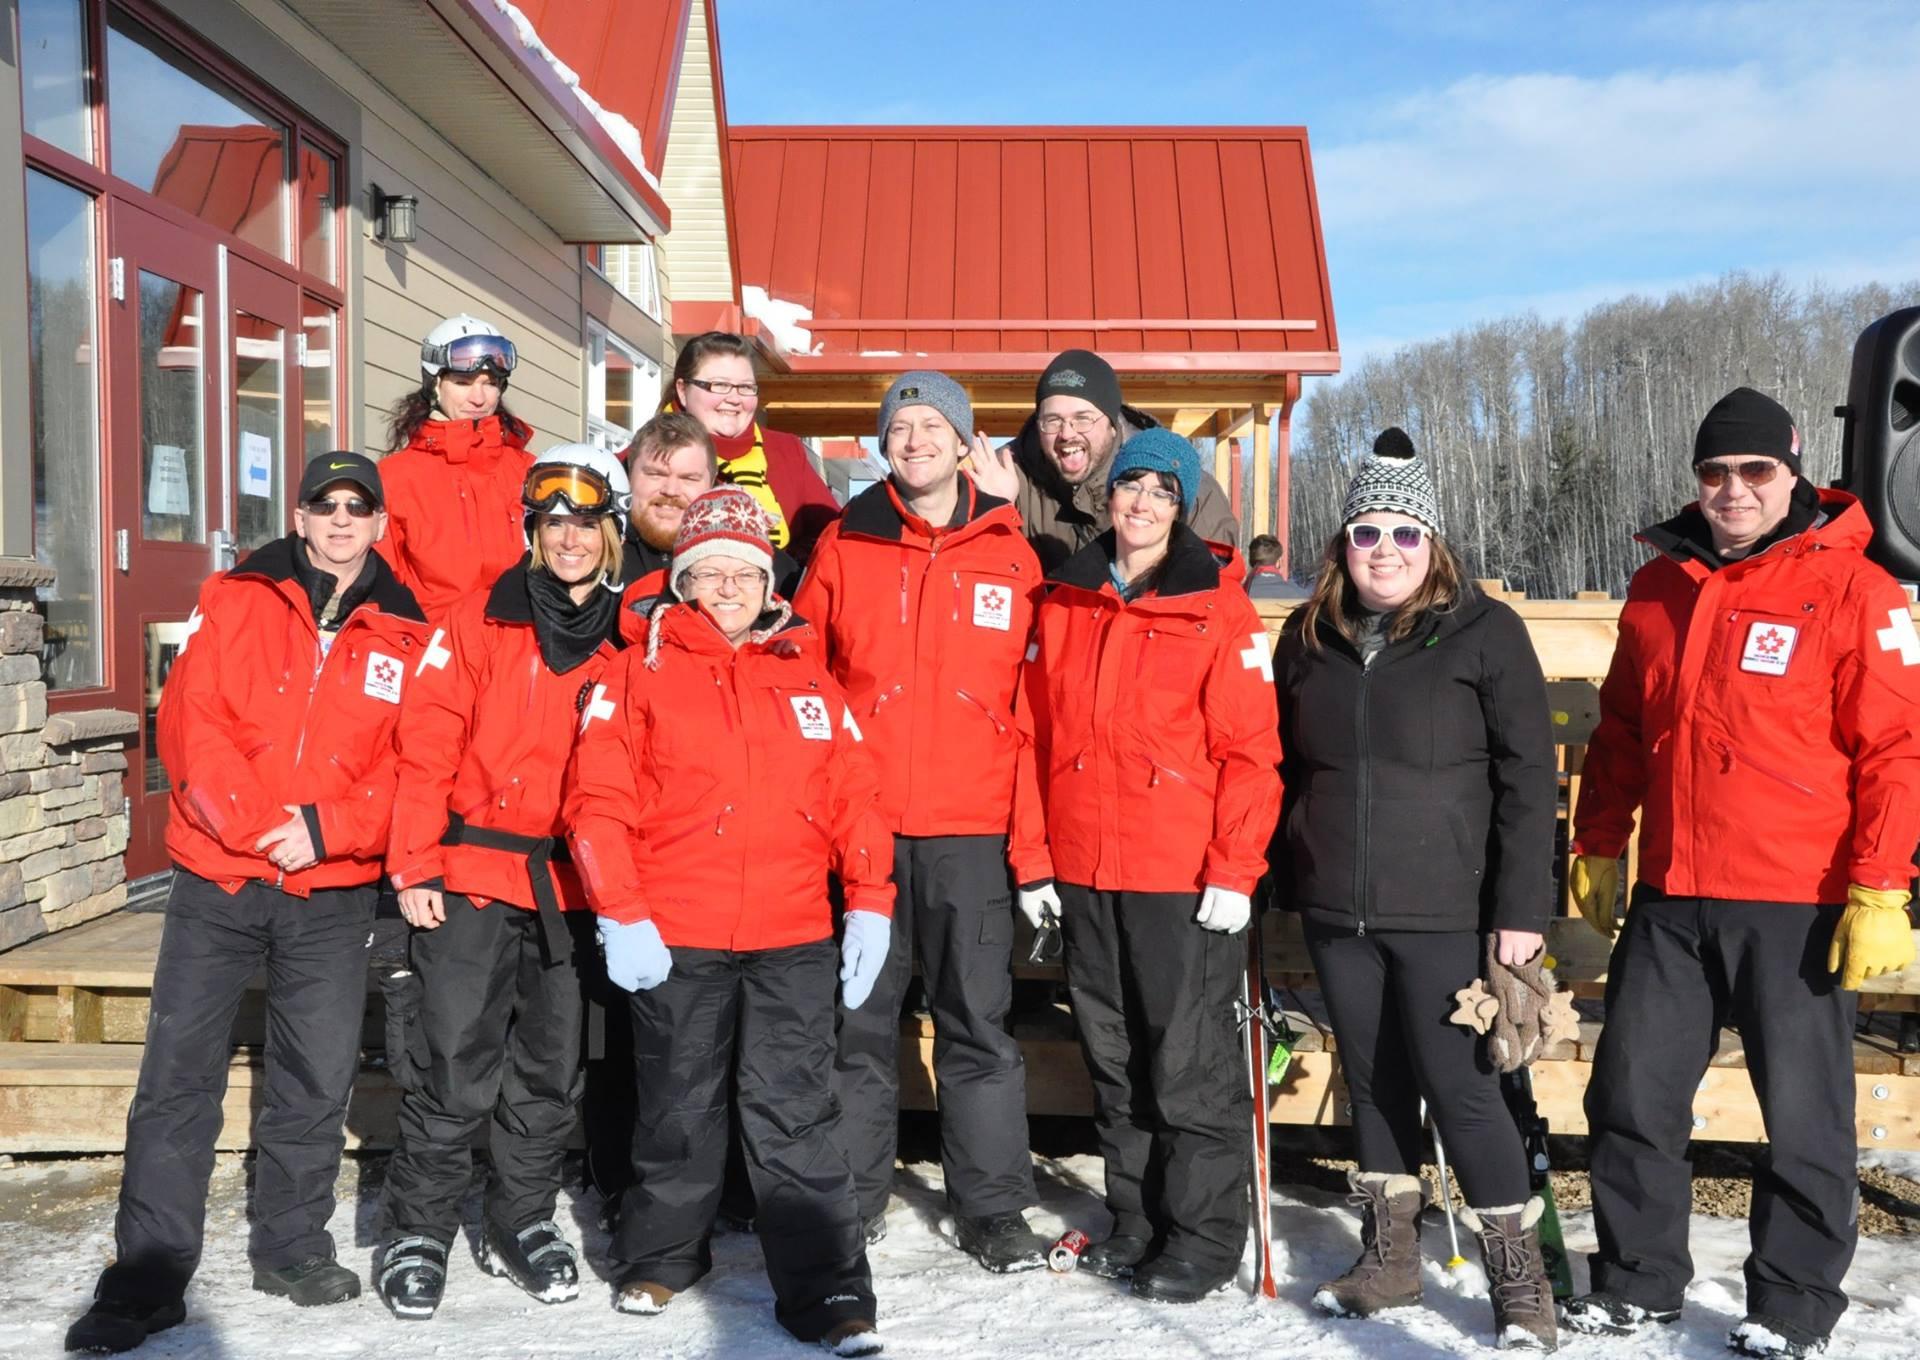 Tawatinaw Valley Ski Patrol Team